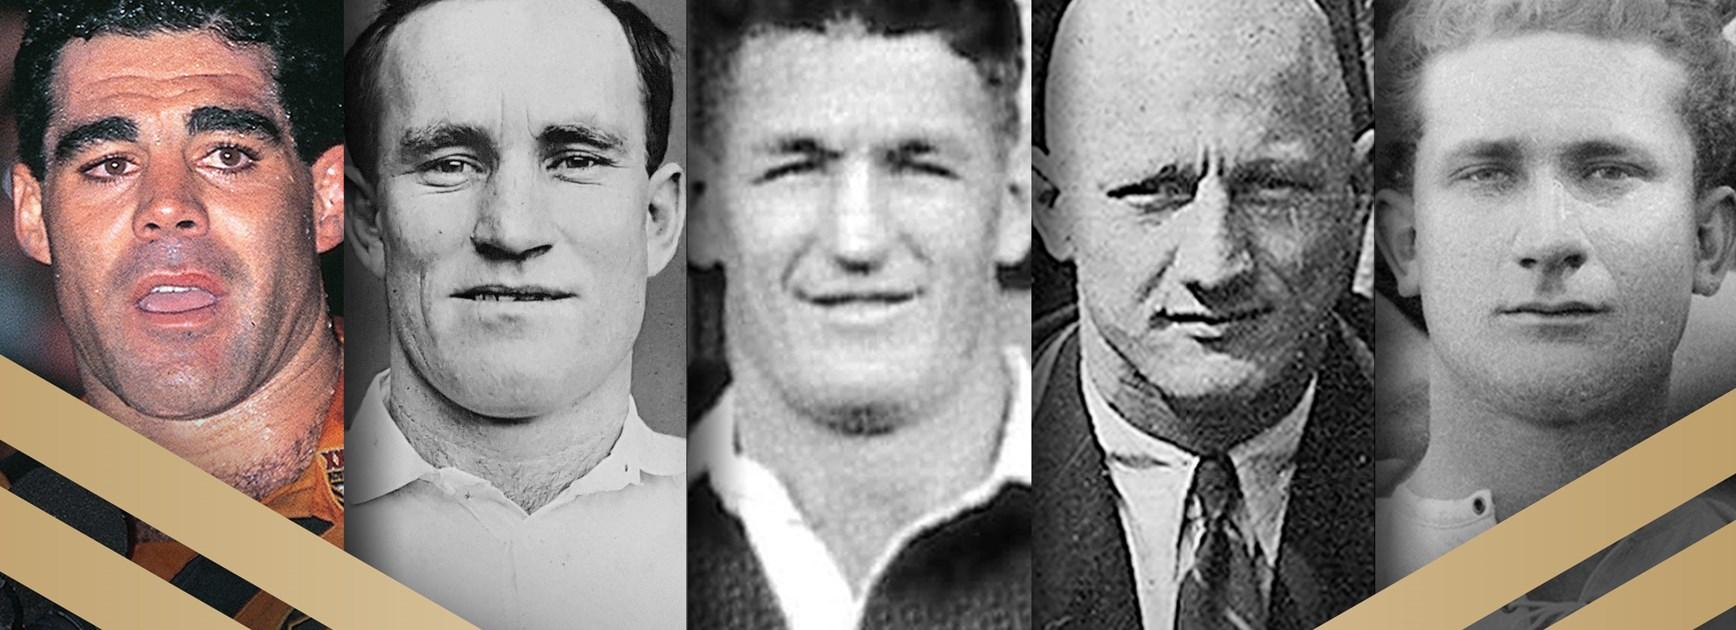 Messenger, Brown, Burge, Provan, Meninga announced as Immortals